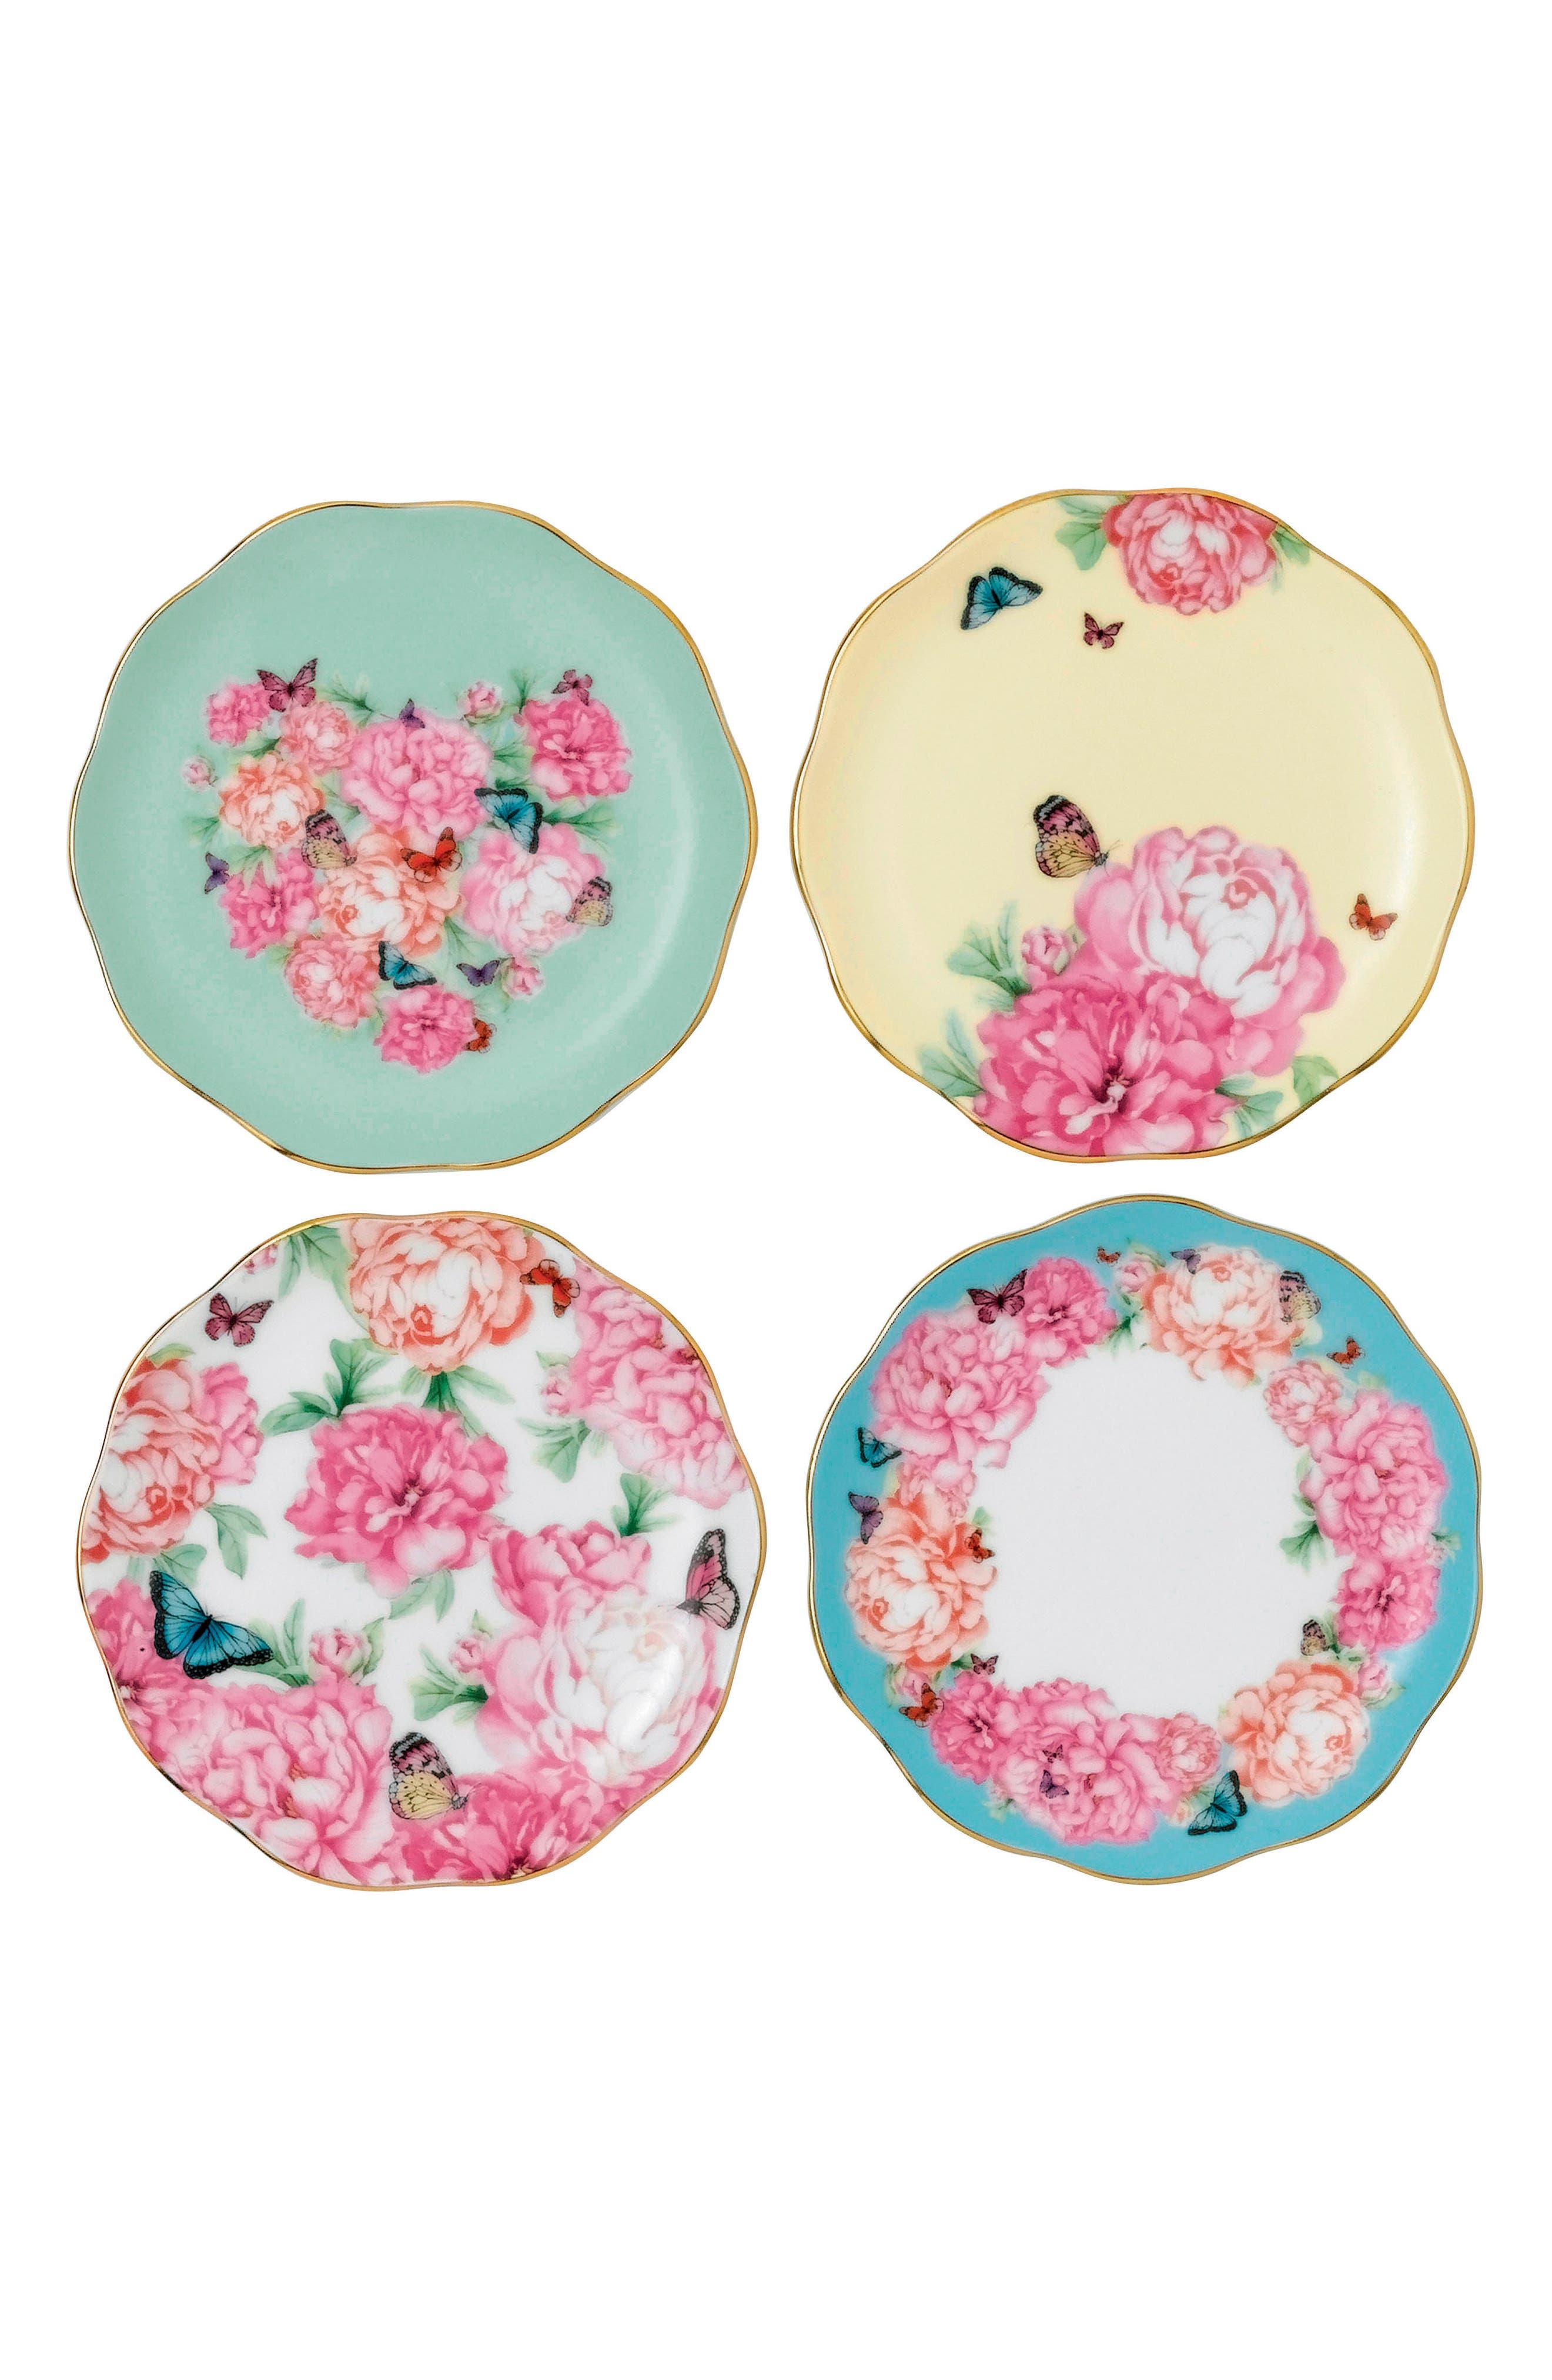 Set of 4 Assorted Tidbit Plates,                             Main thumbnail 1, color,                             650